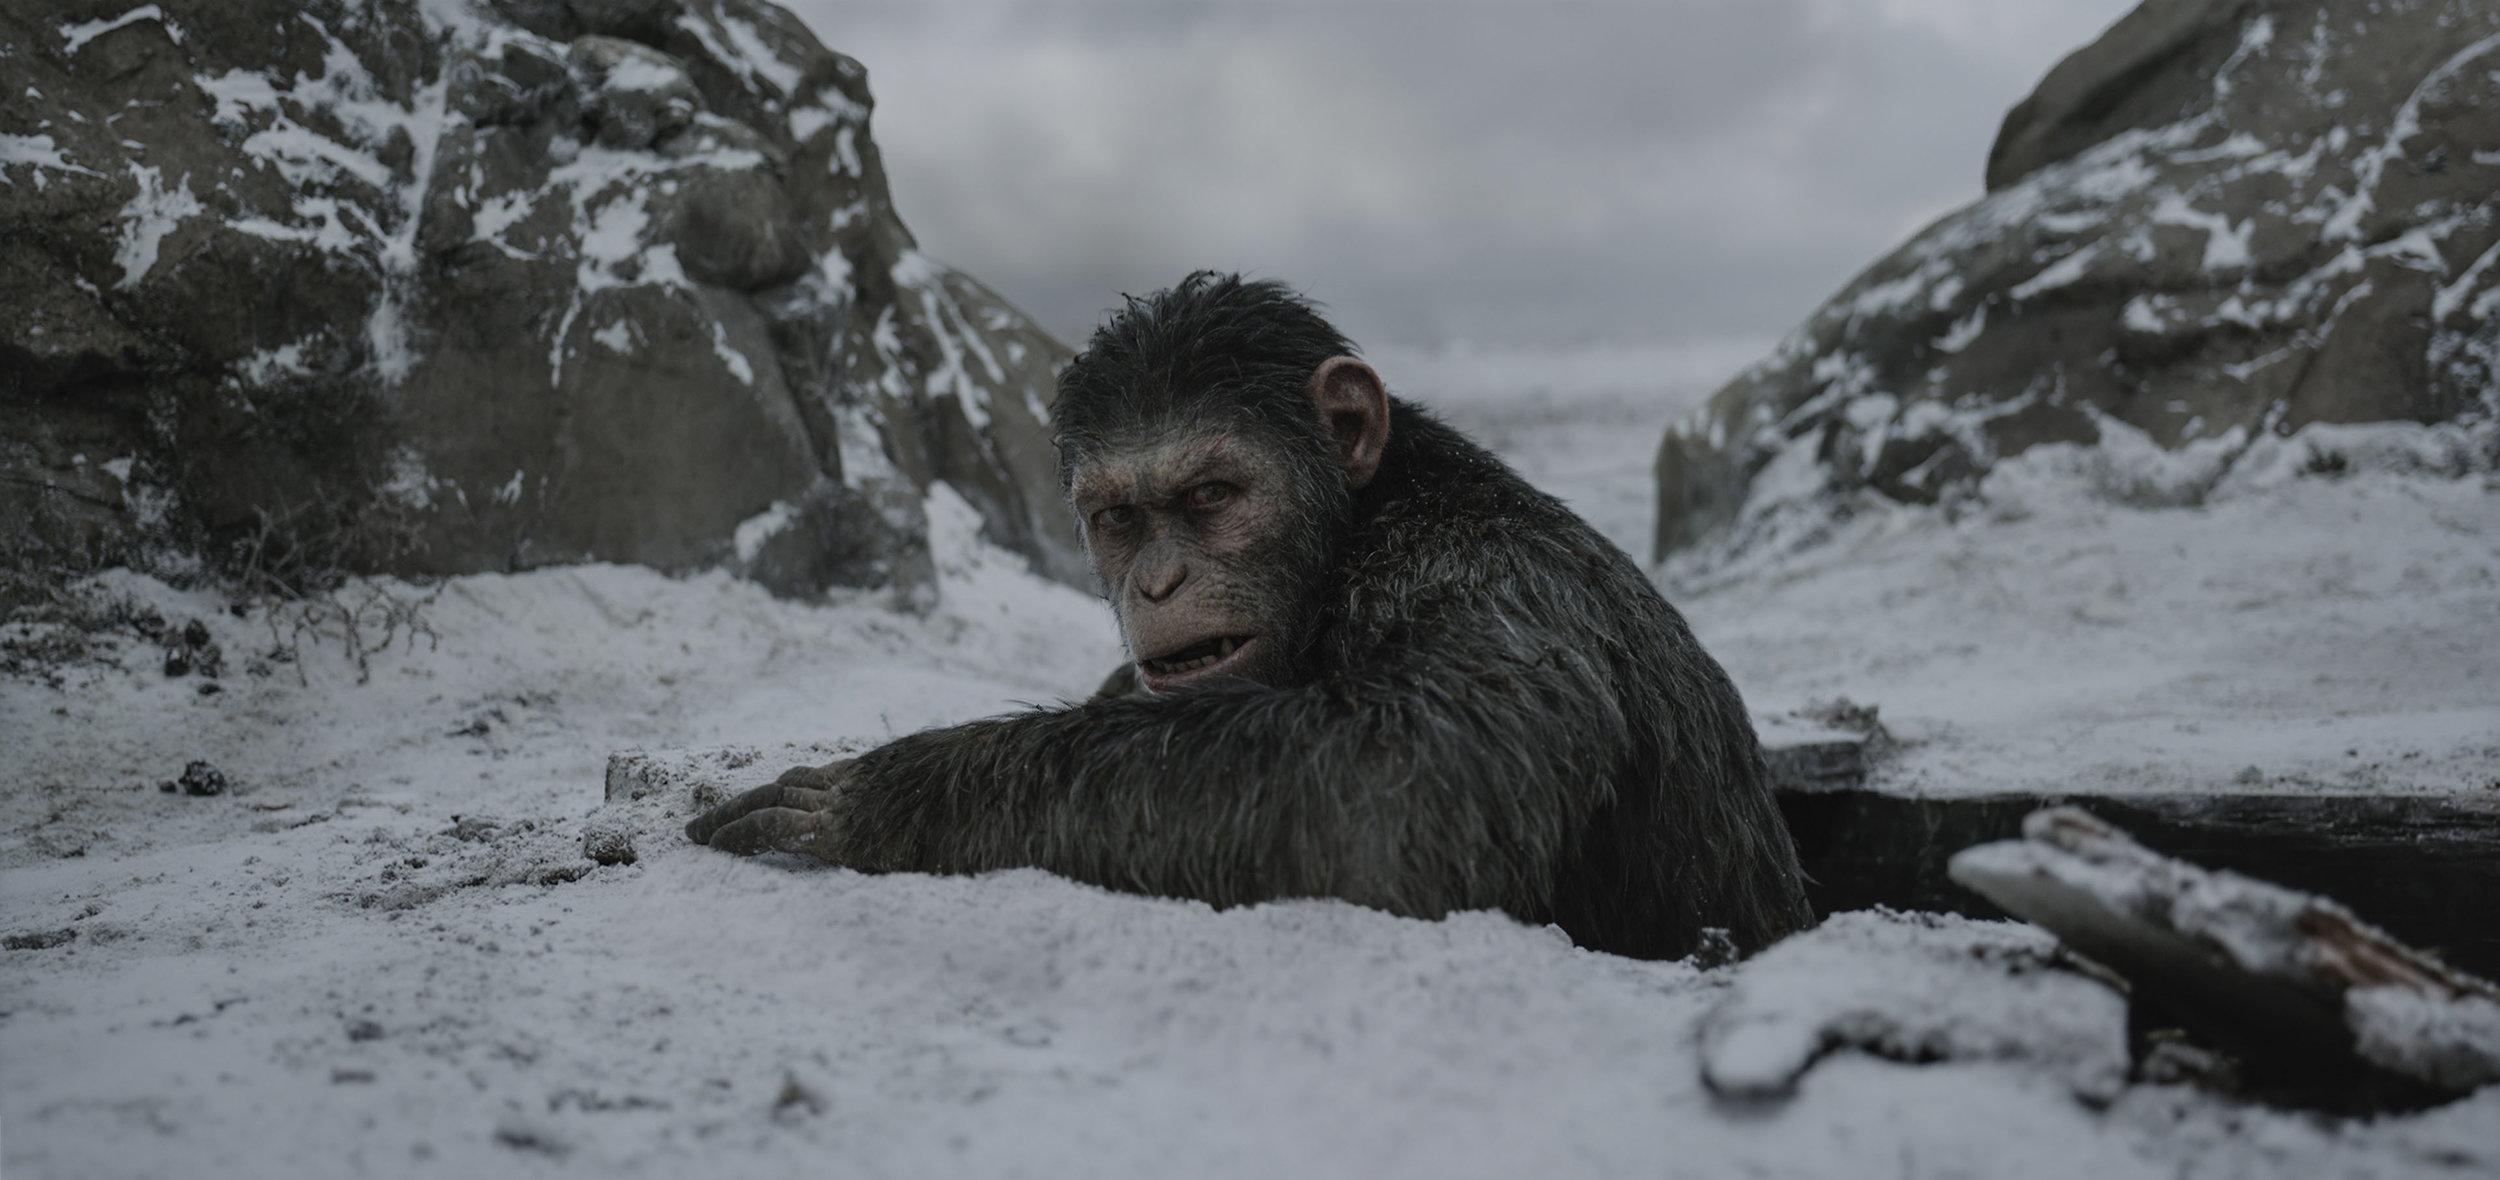 (Image courtesy of 20th Century Fox via EPK.tv)